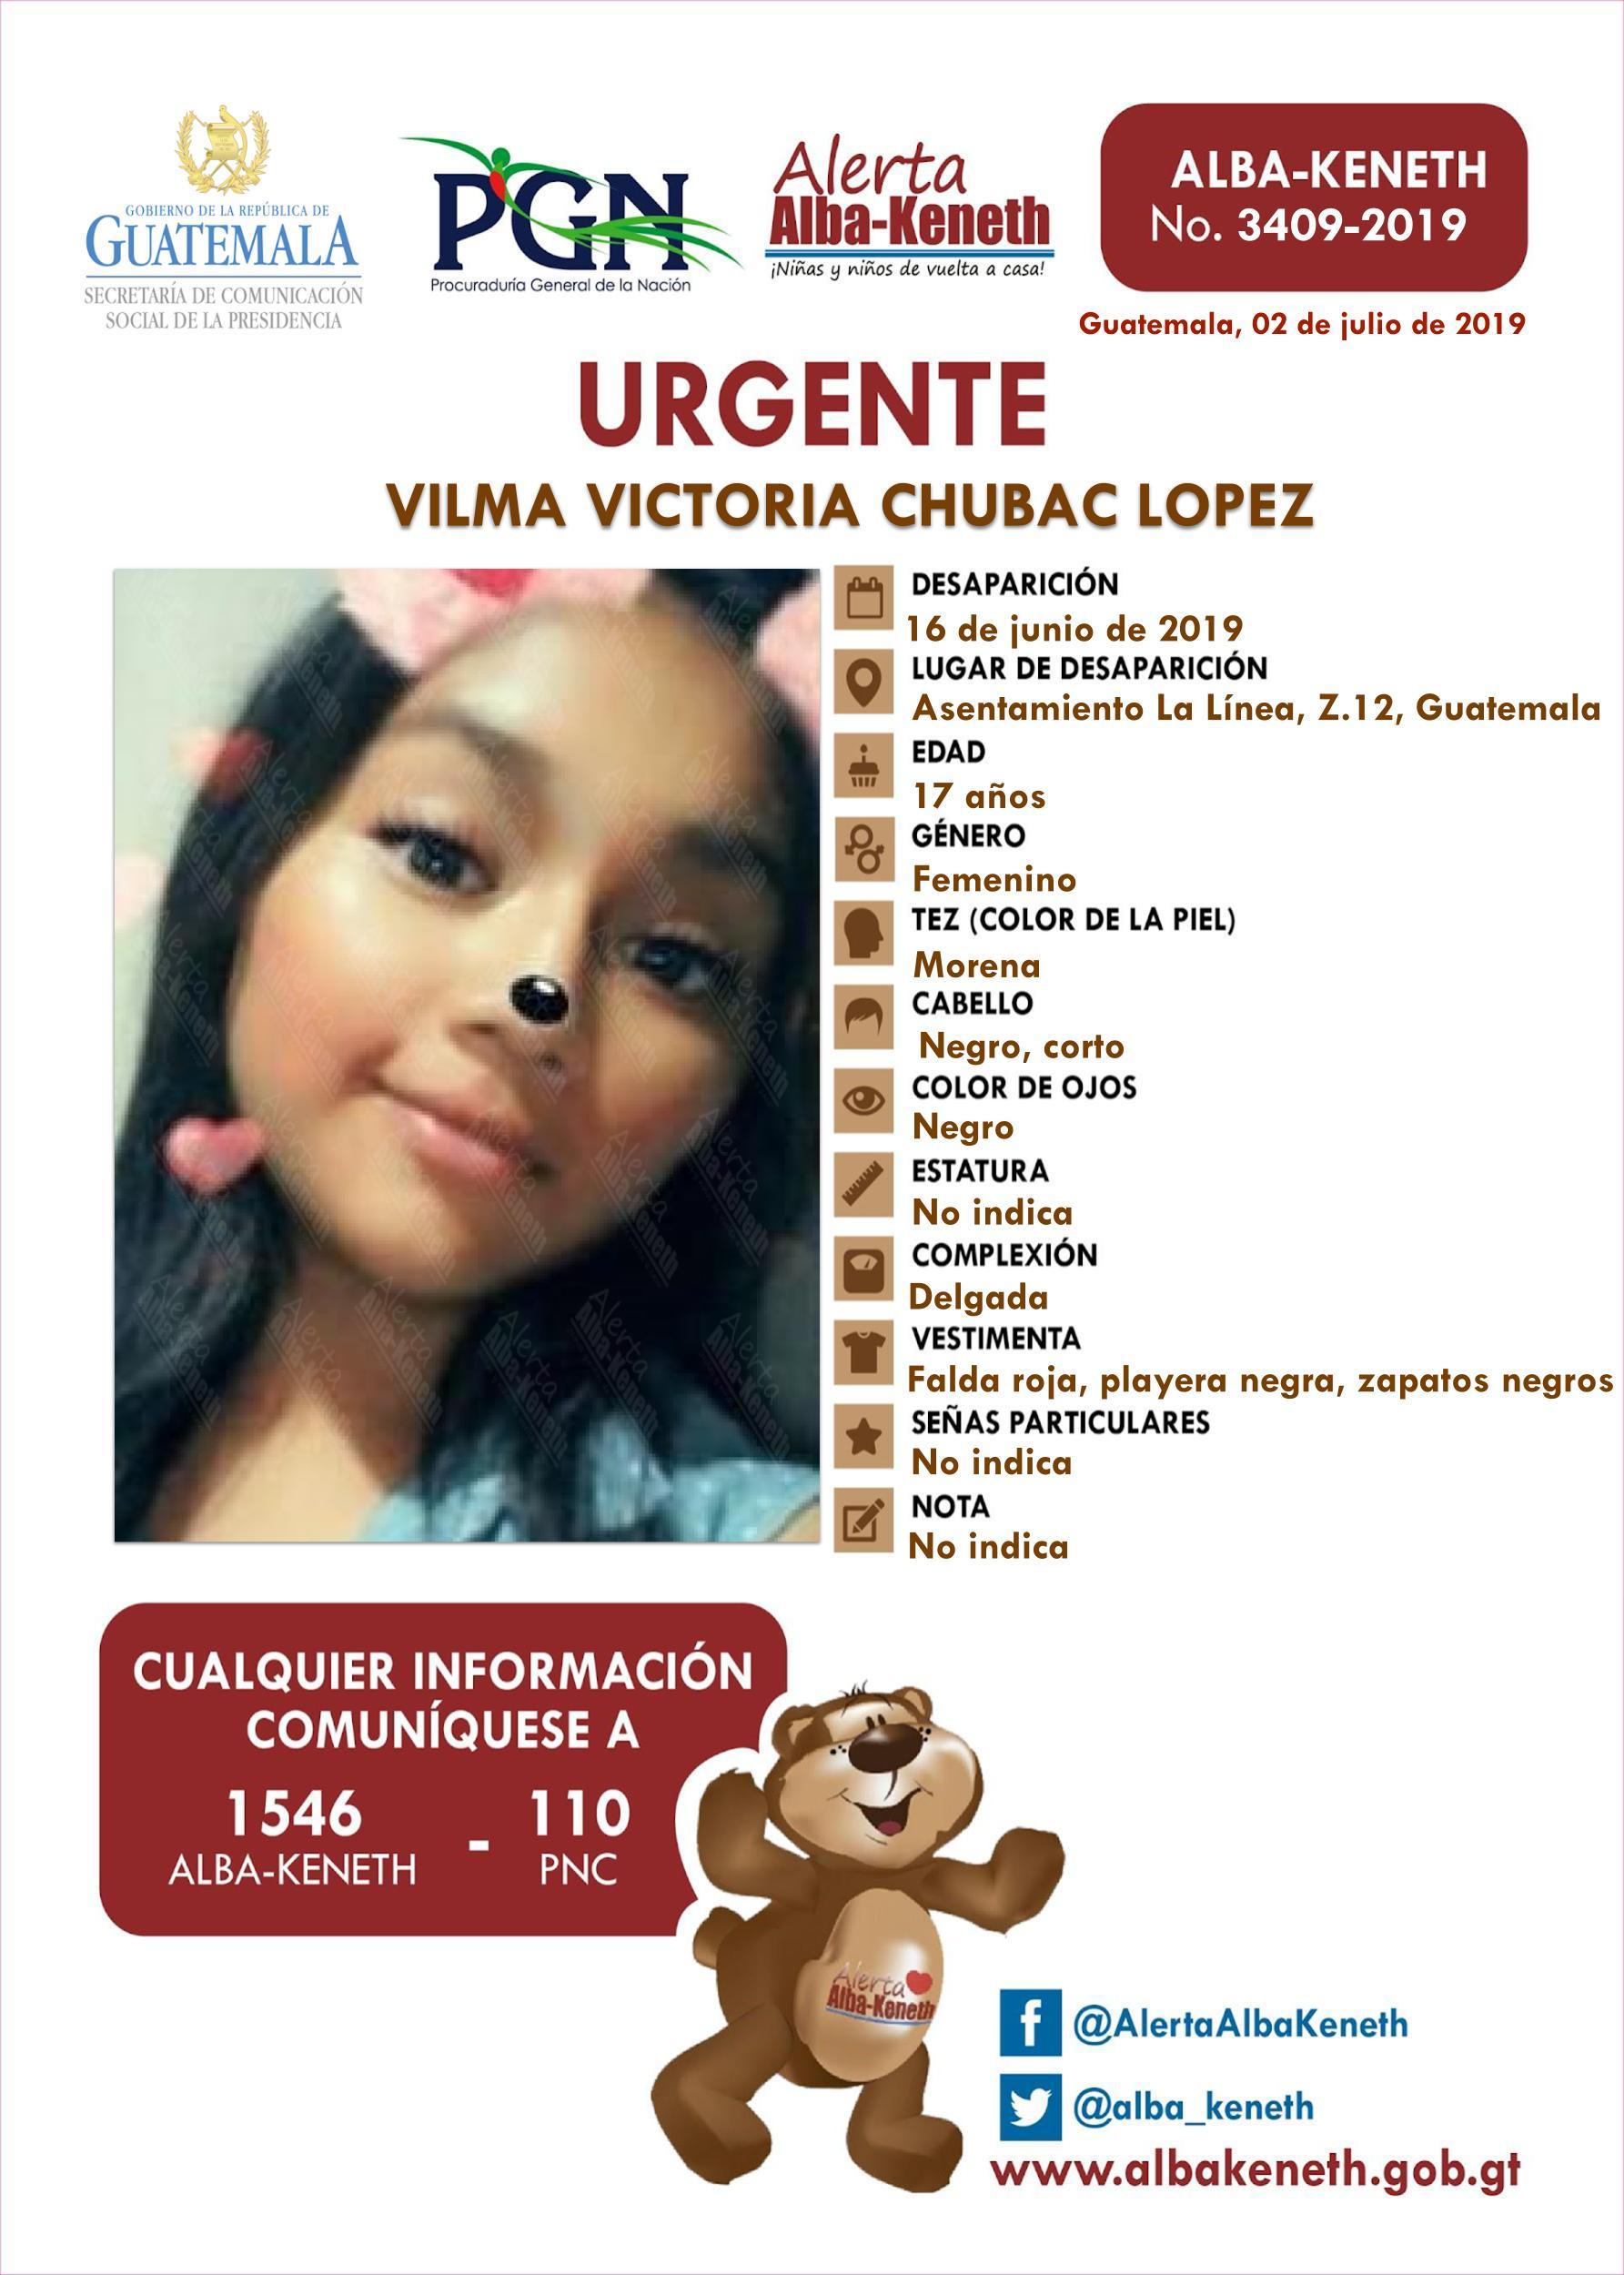 Vilma Victoria Chubac Lopez